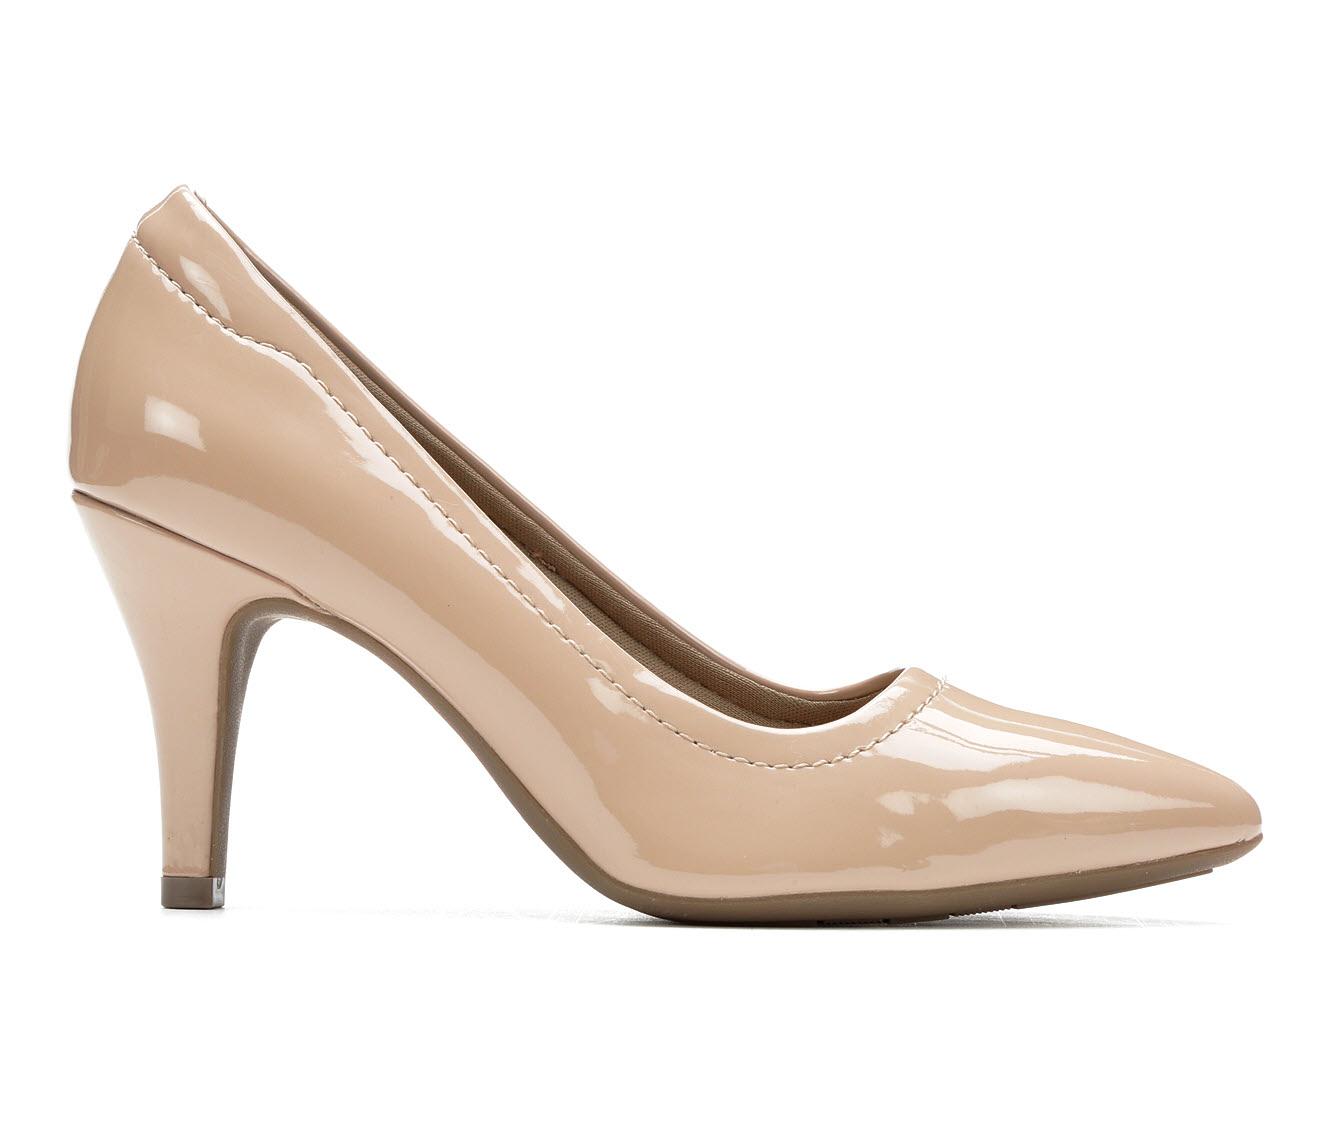 Andiamo Gina Women's Dress Shoe (Beige Faux Leather)